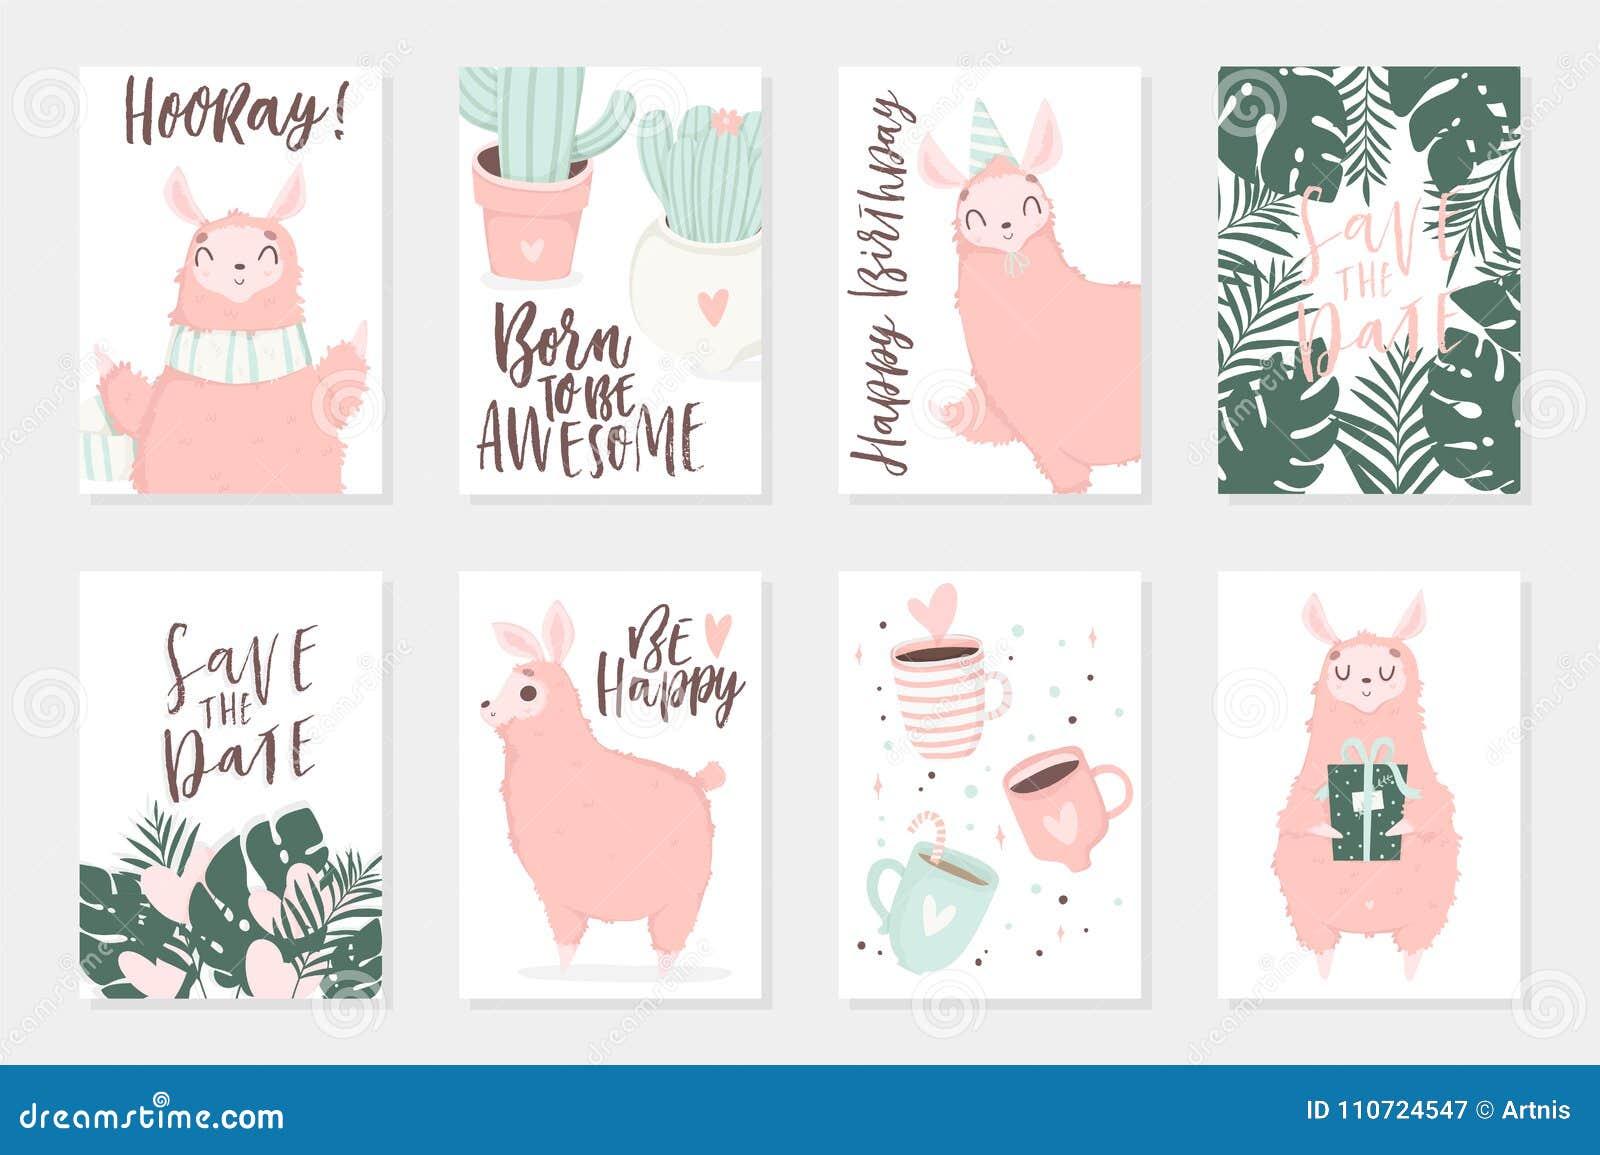 Cute pink lamas hand drawn illustrations. Set of 8 cute cards